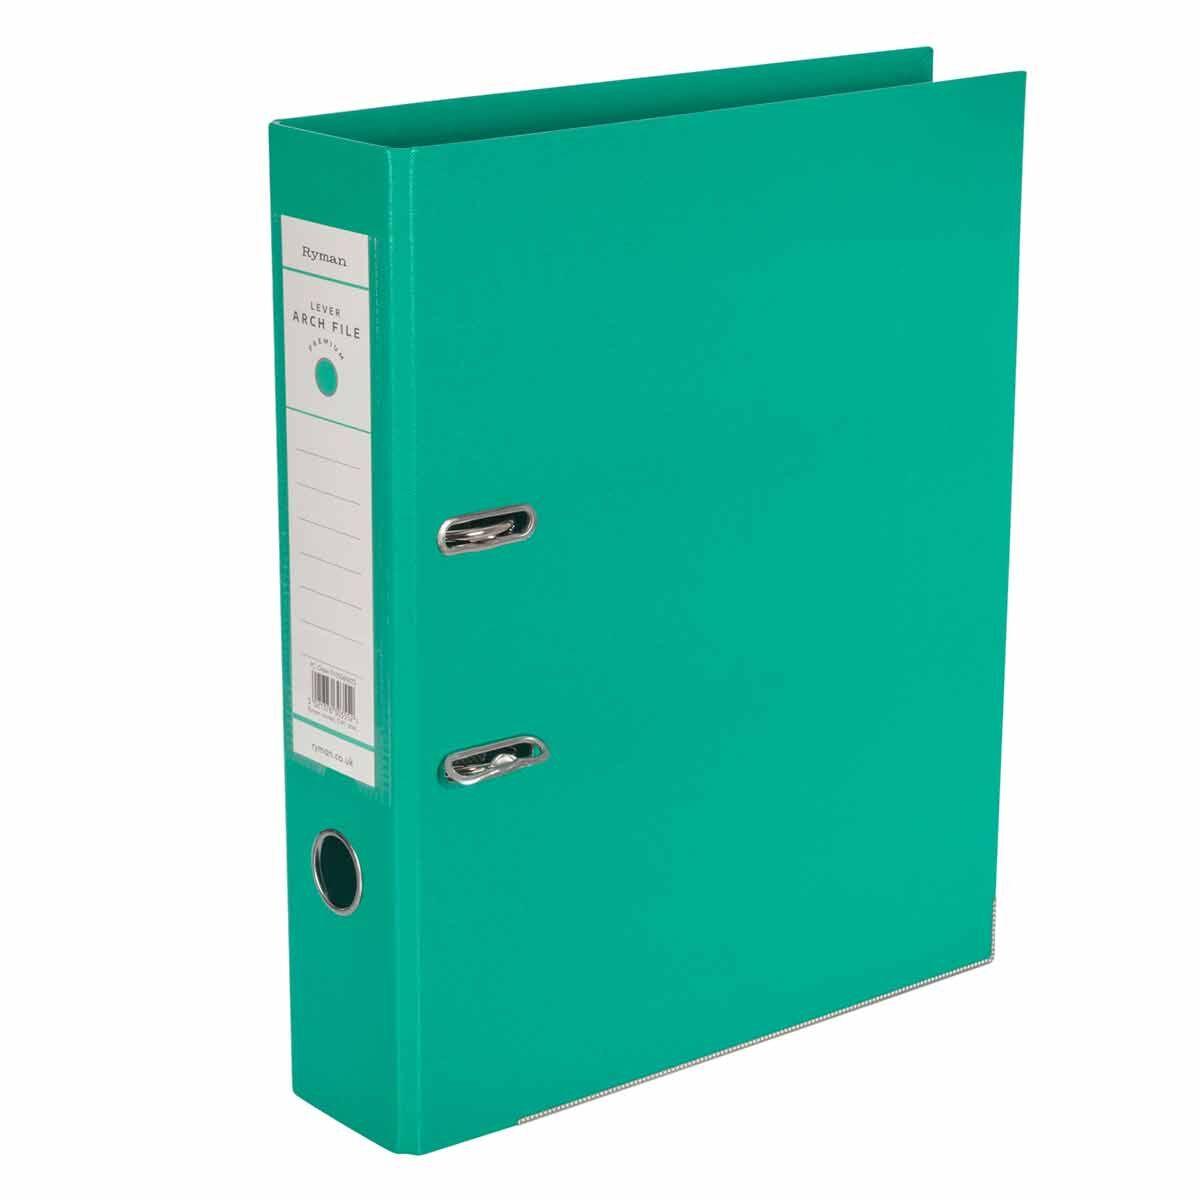 Ryman Premium Lever Arch File Foolscap Green